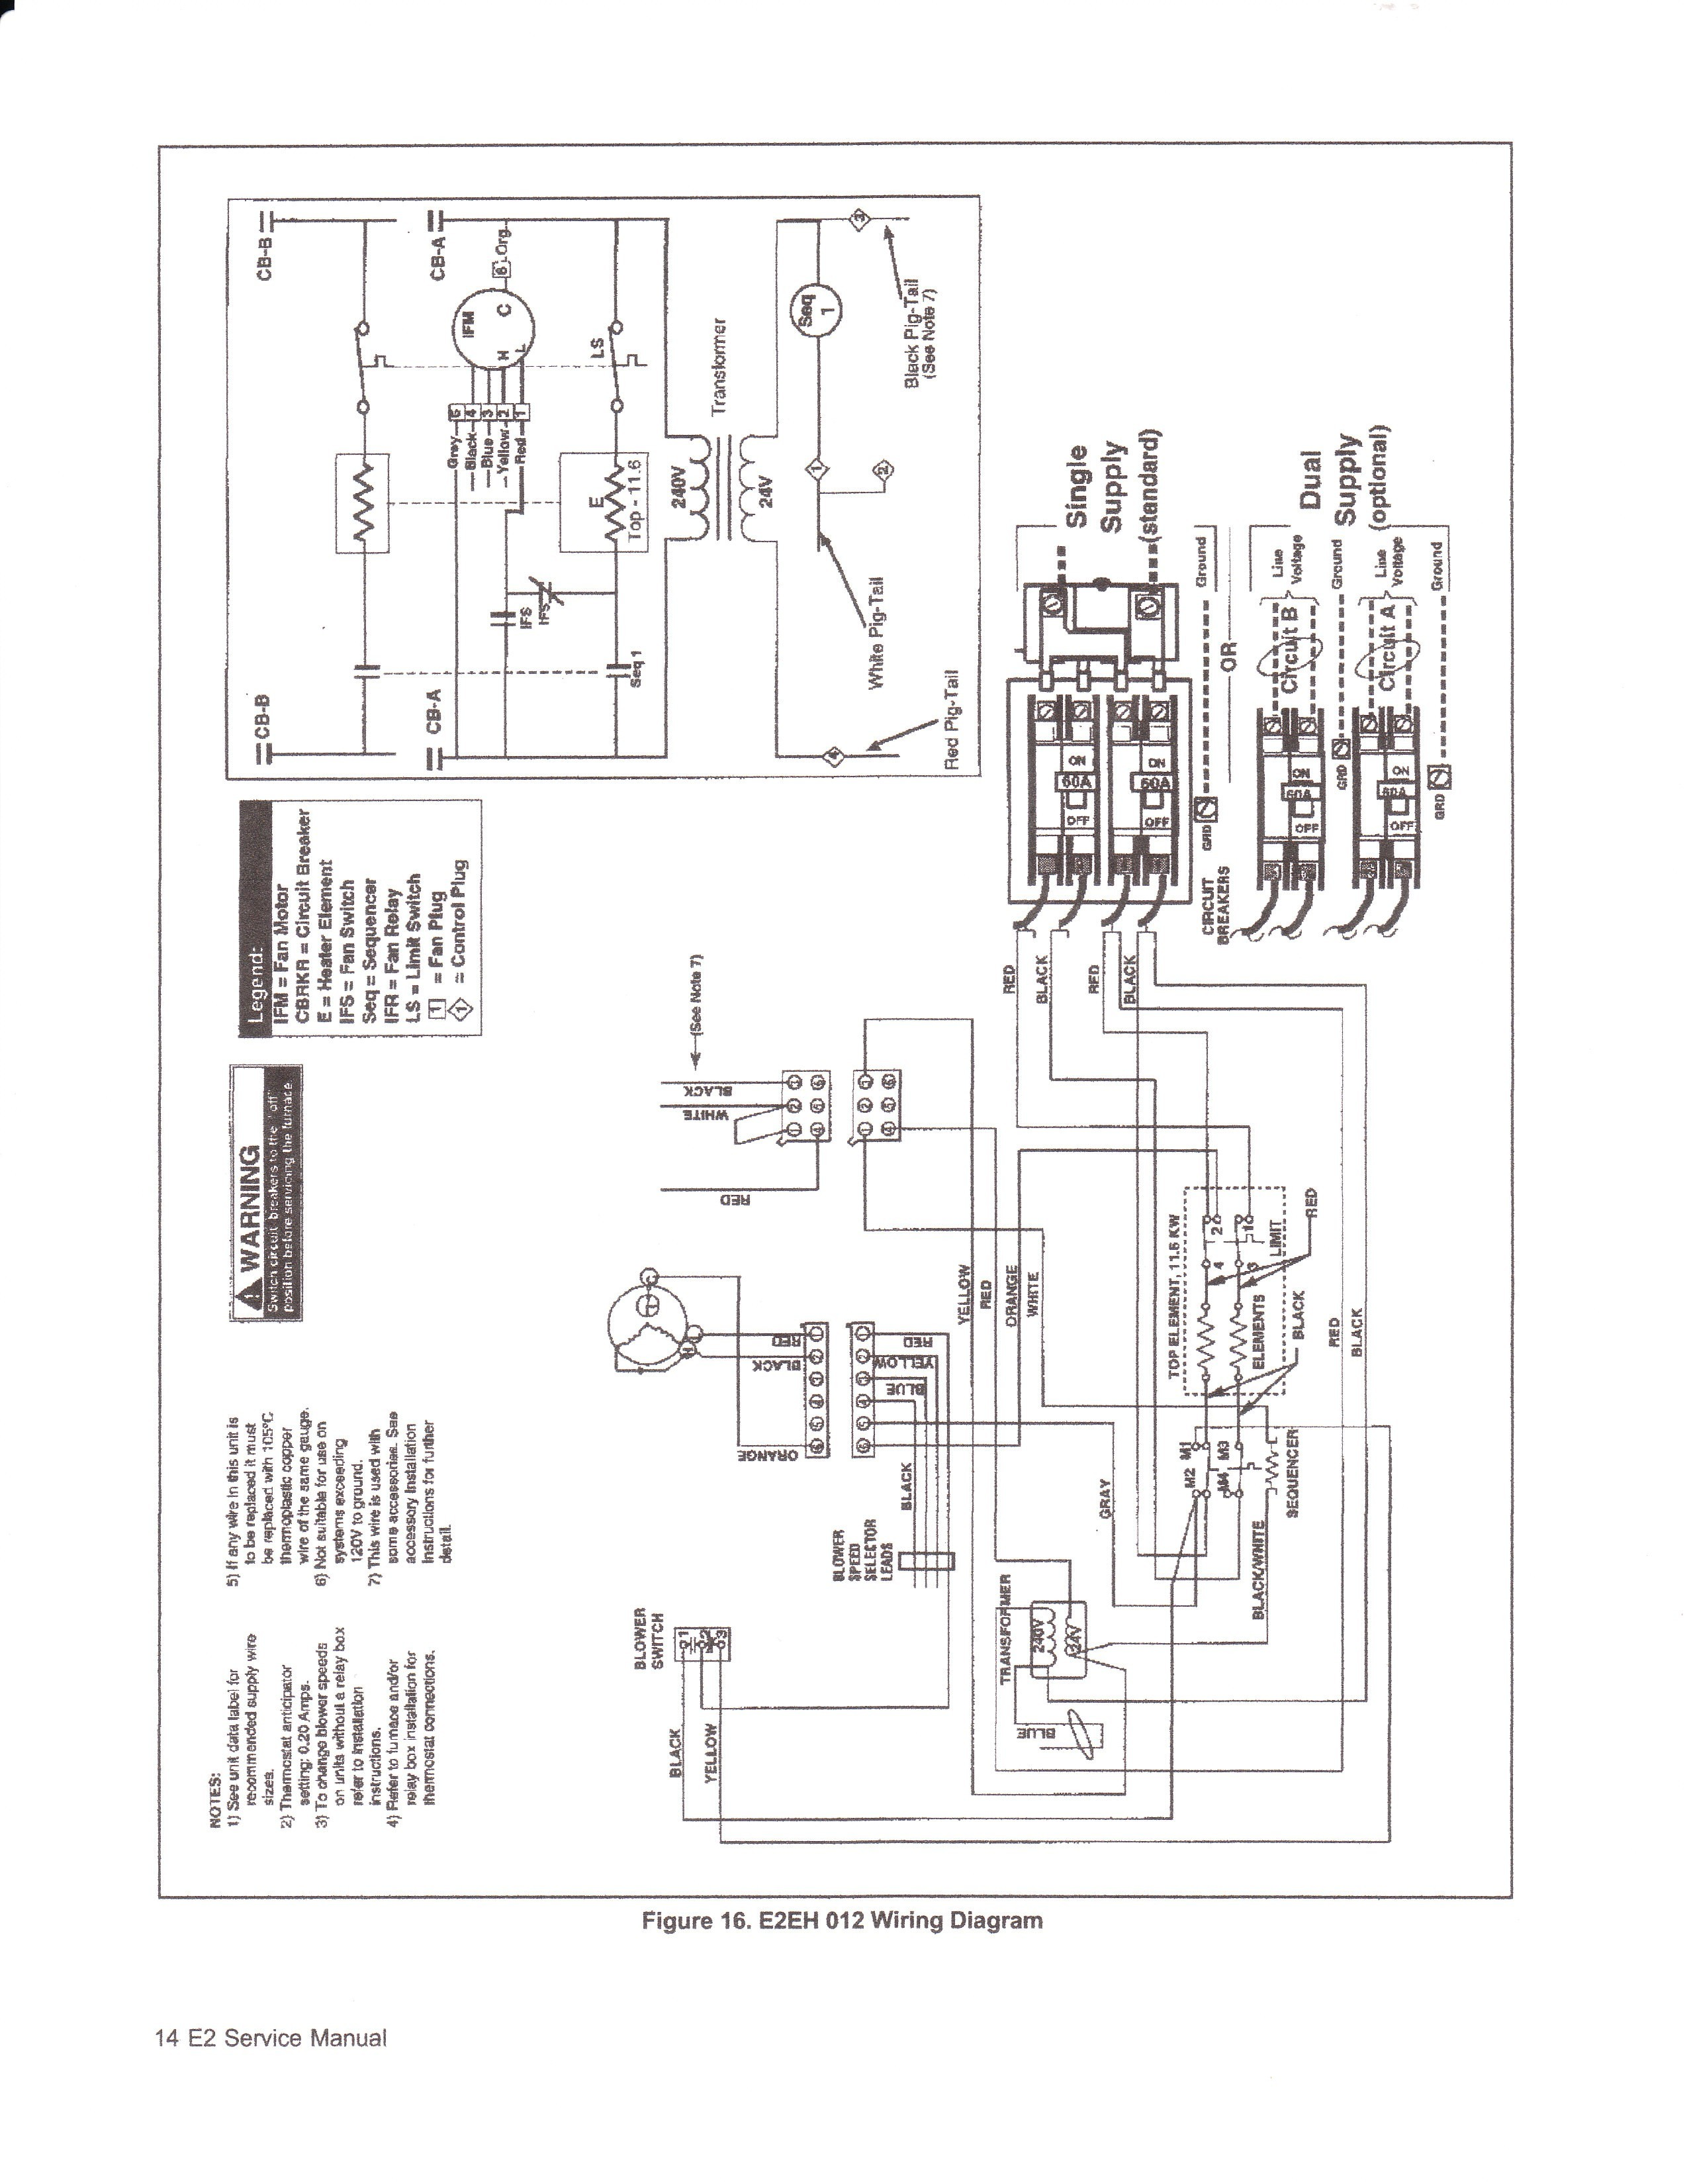 Intertherm Electric Furnace Wiring Diagram Inspirational 9 Best nordyne Furnace Wiring Diagram E2eb 012ha nordyne